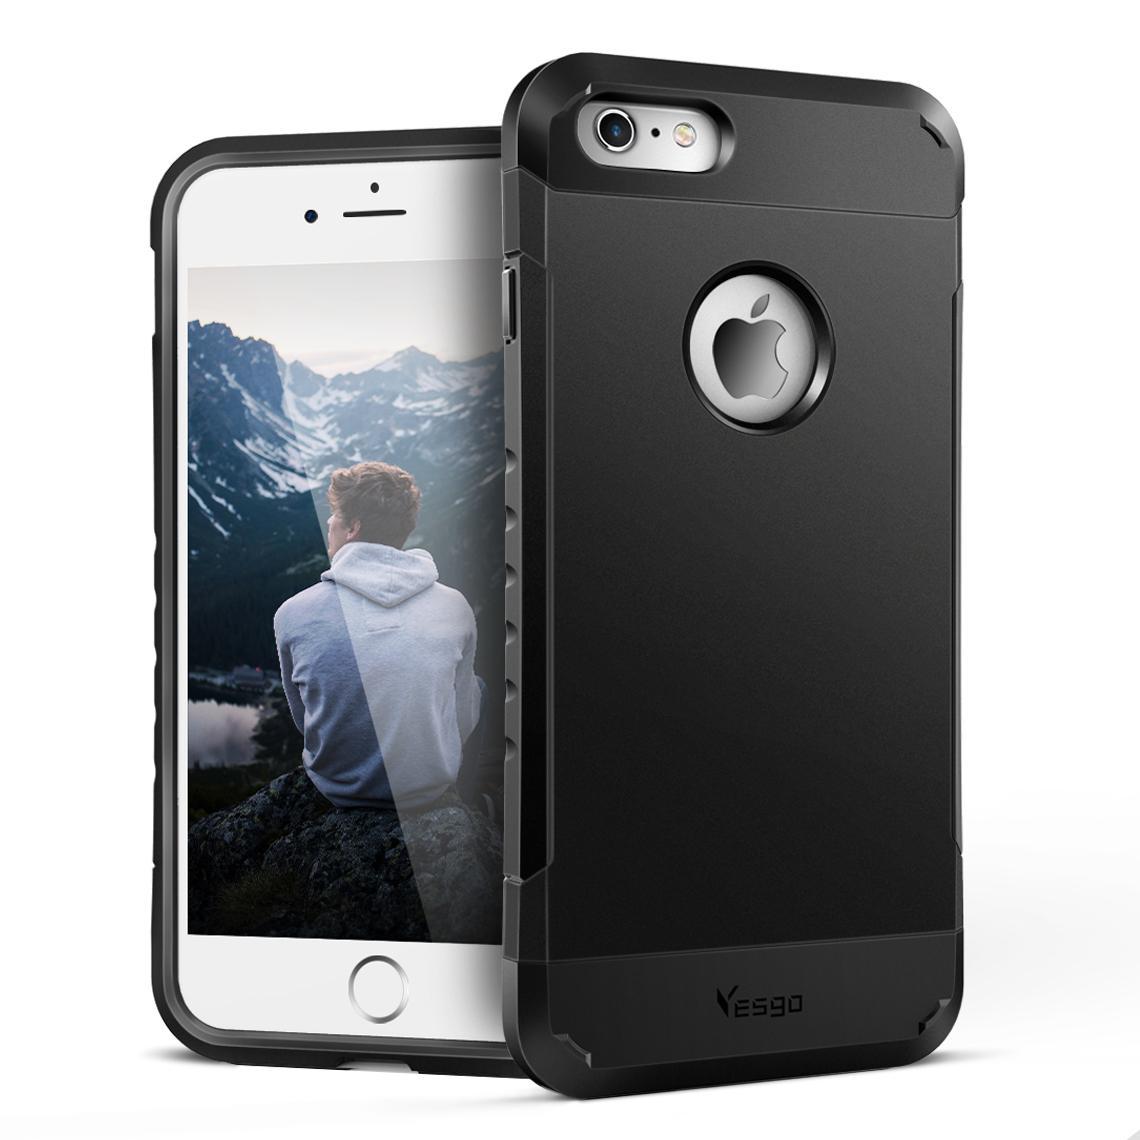 iphone 6s plus case iphone 6 plus case dual. Black Bedroom Furniture Sets. Home Design Ideas